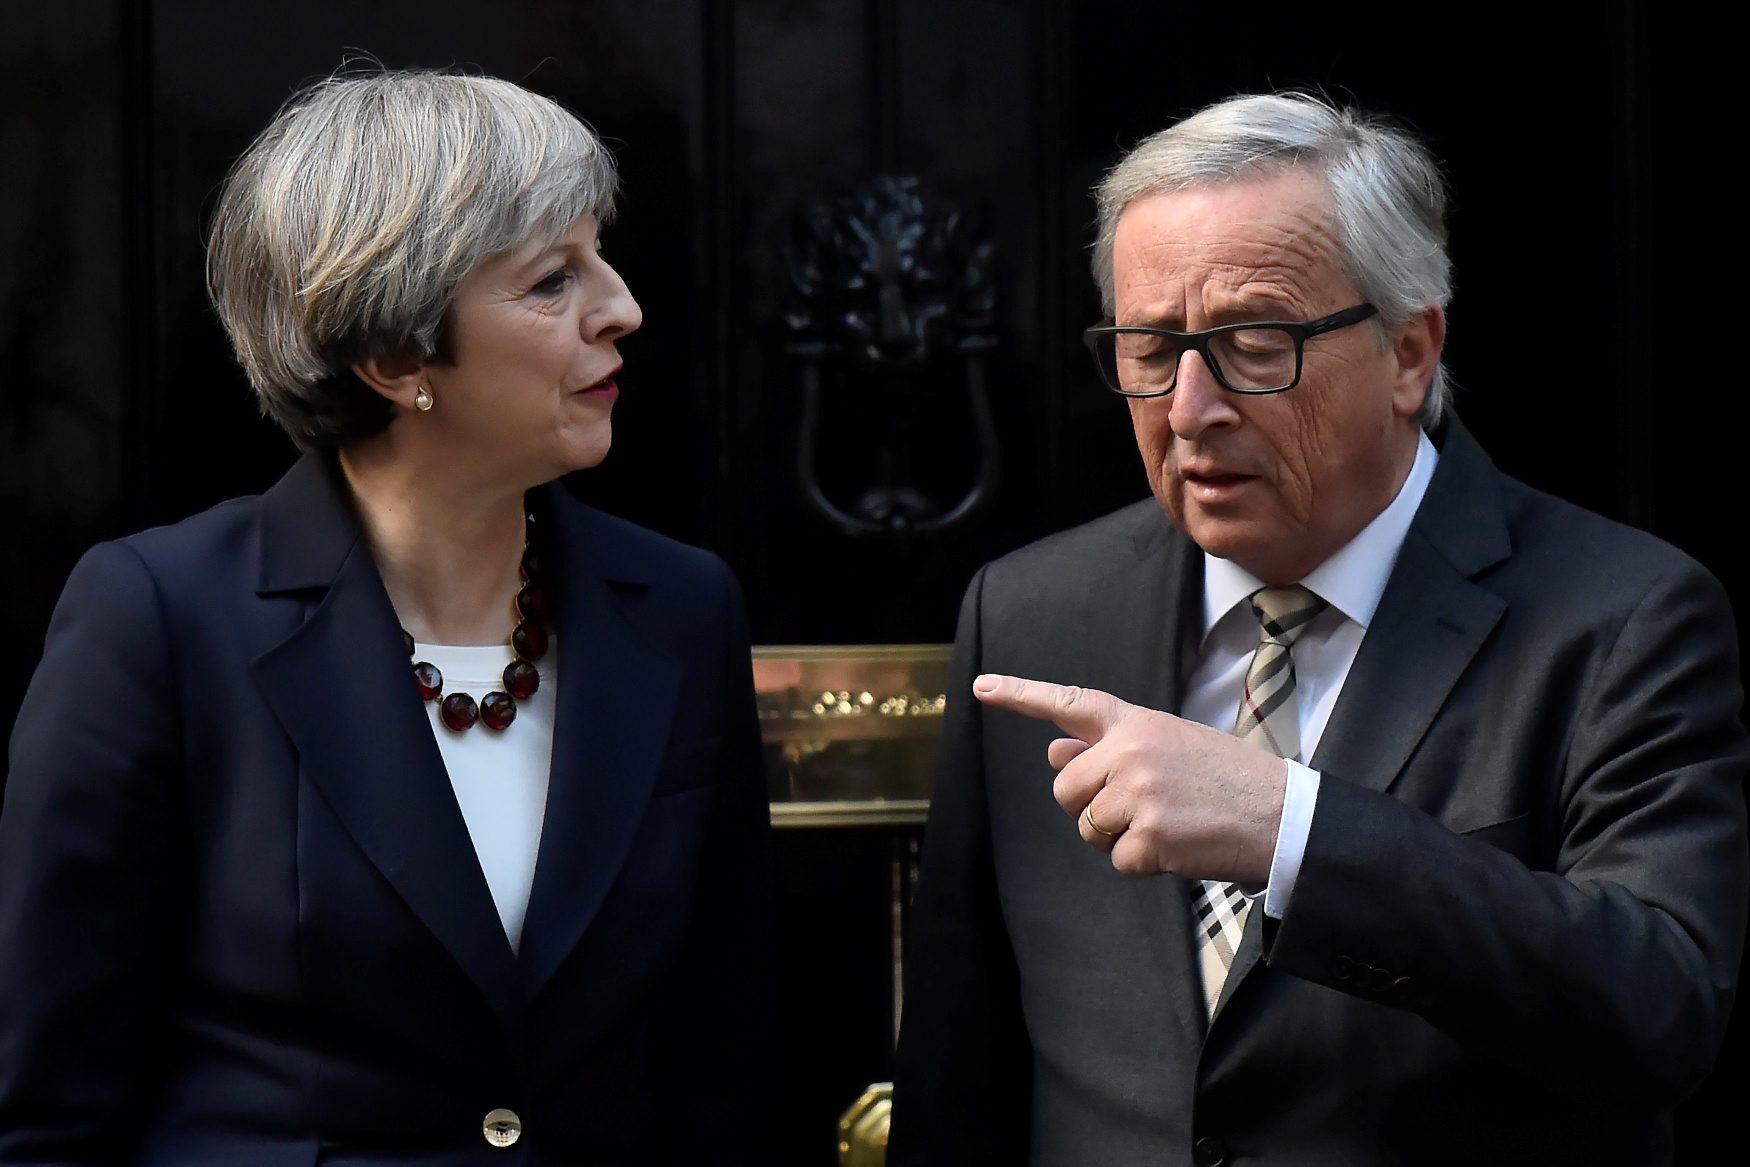 Britanska premijerka Theresa May i predsjednik EK Jean-Claude Juncker